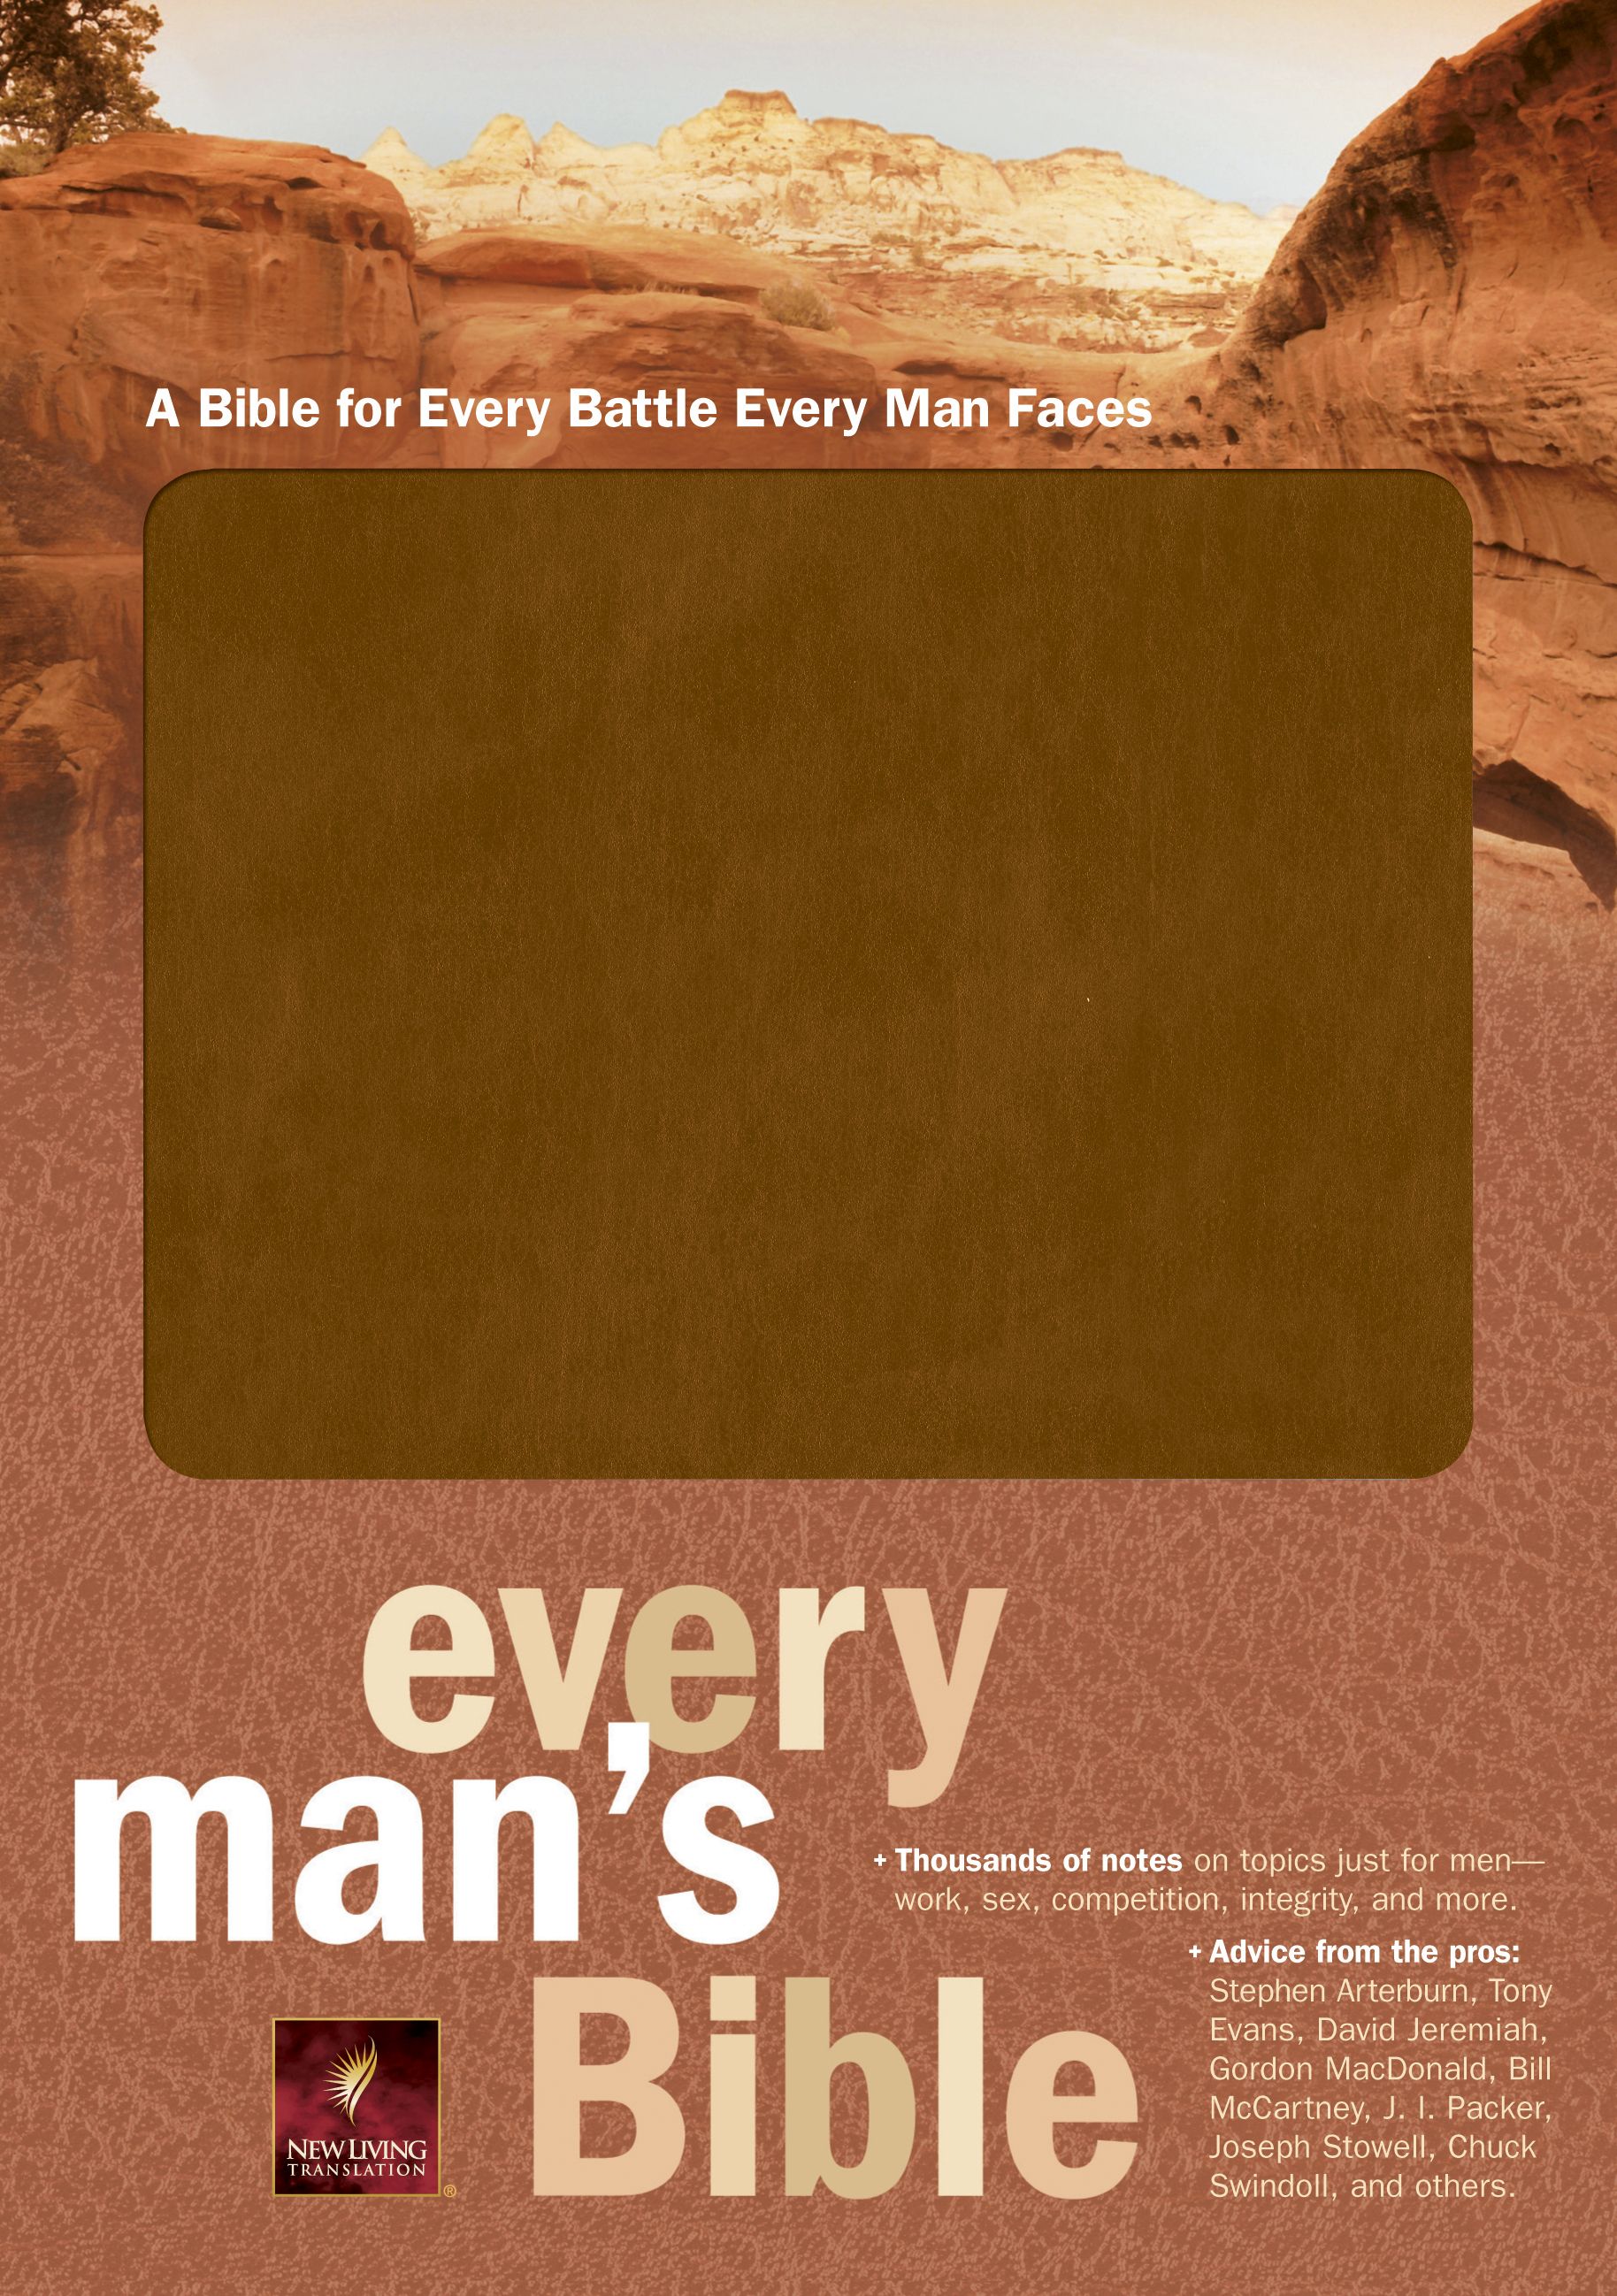 Men of Integrity Bible Studies | Bible Studies by Type ...